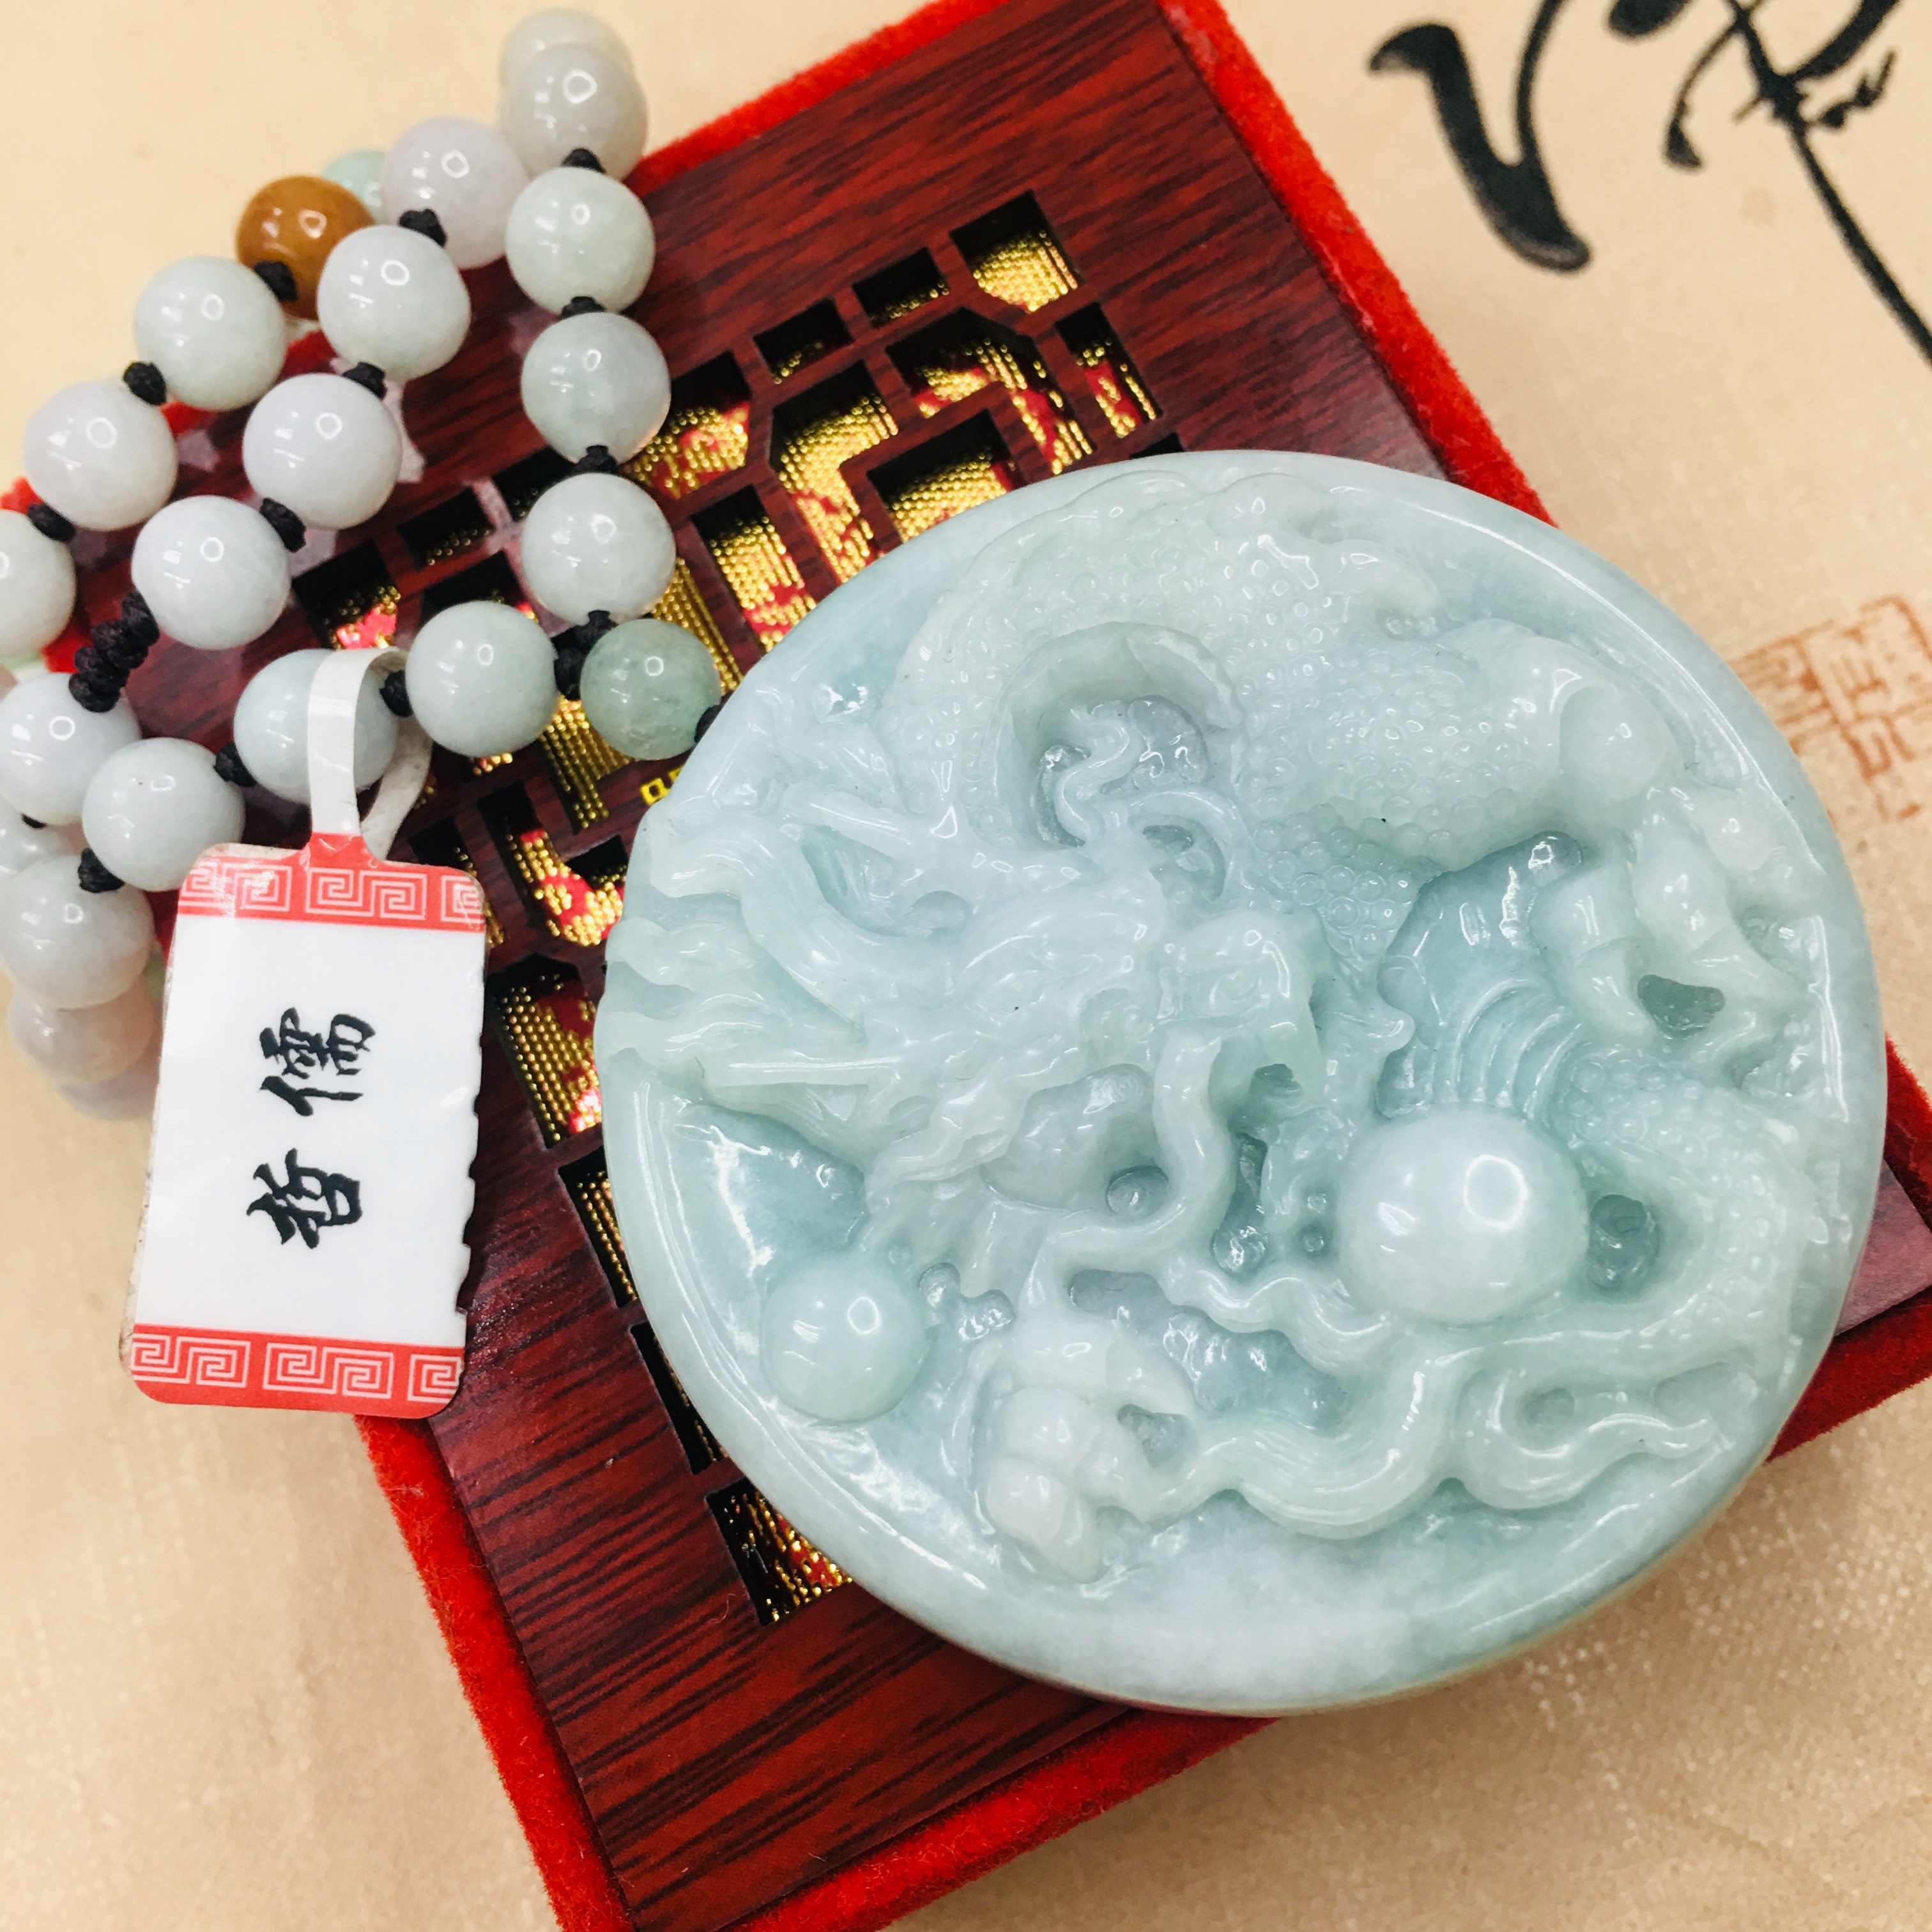 Zheru 純粋な天然硬玉彫刻ライトグリーン大ドラゴン再生ビーズペンダント三色ビーズのセーターチェーンを送信を certif